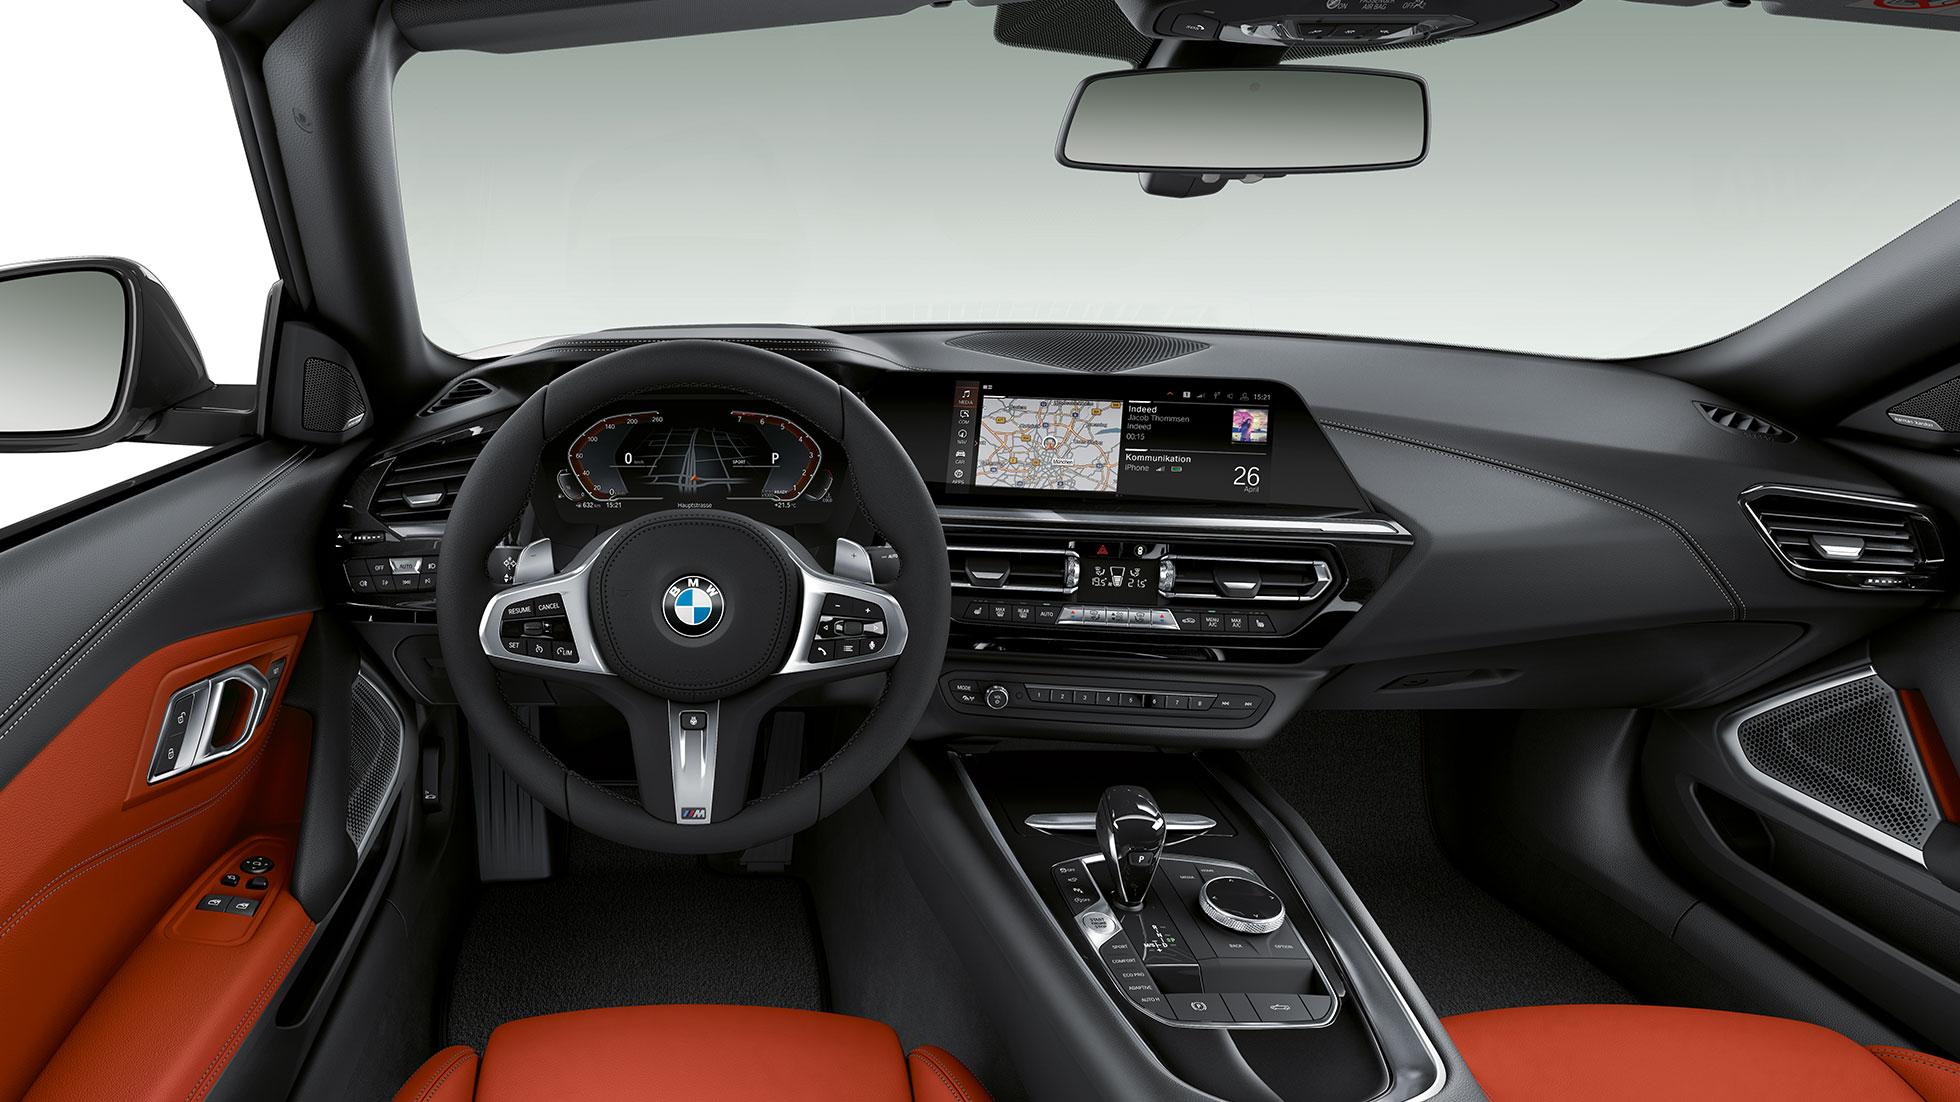 2a260ef5e38 BMW Z4 Roadster  informace a detaily